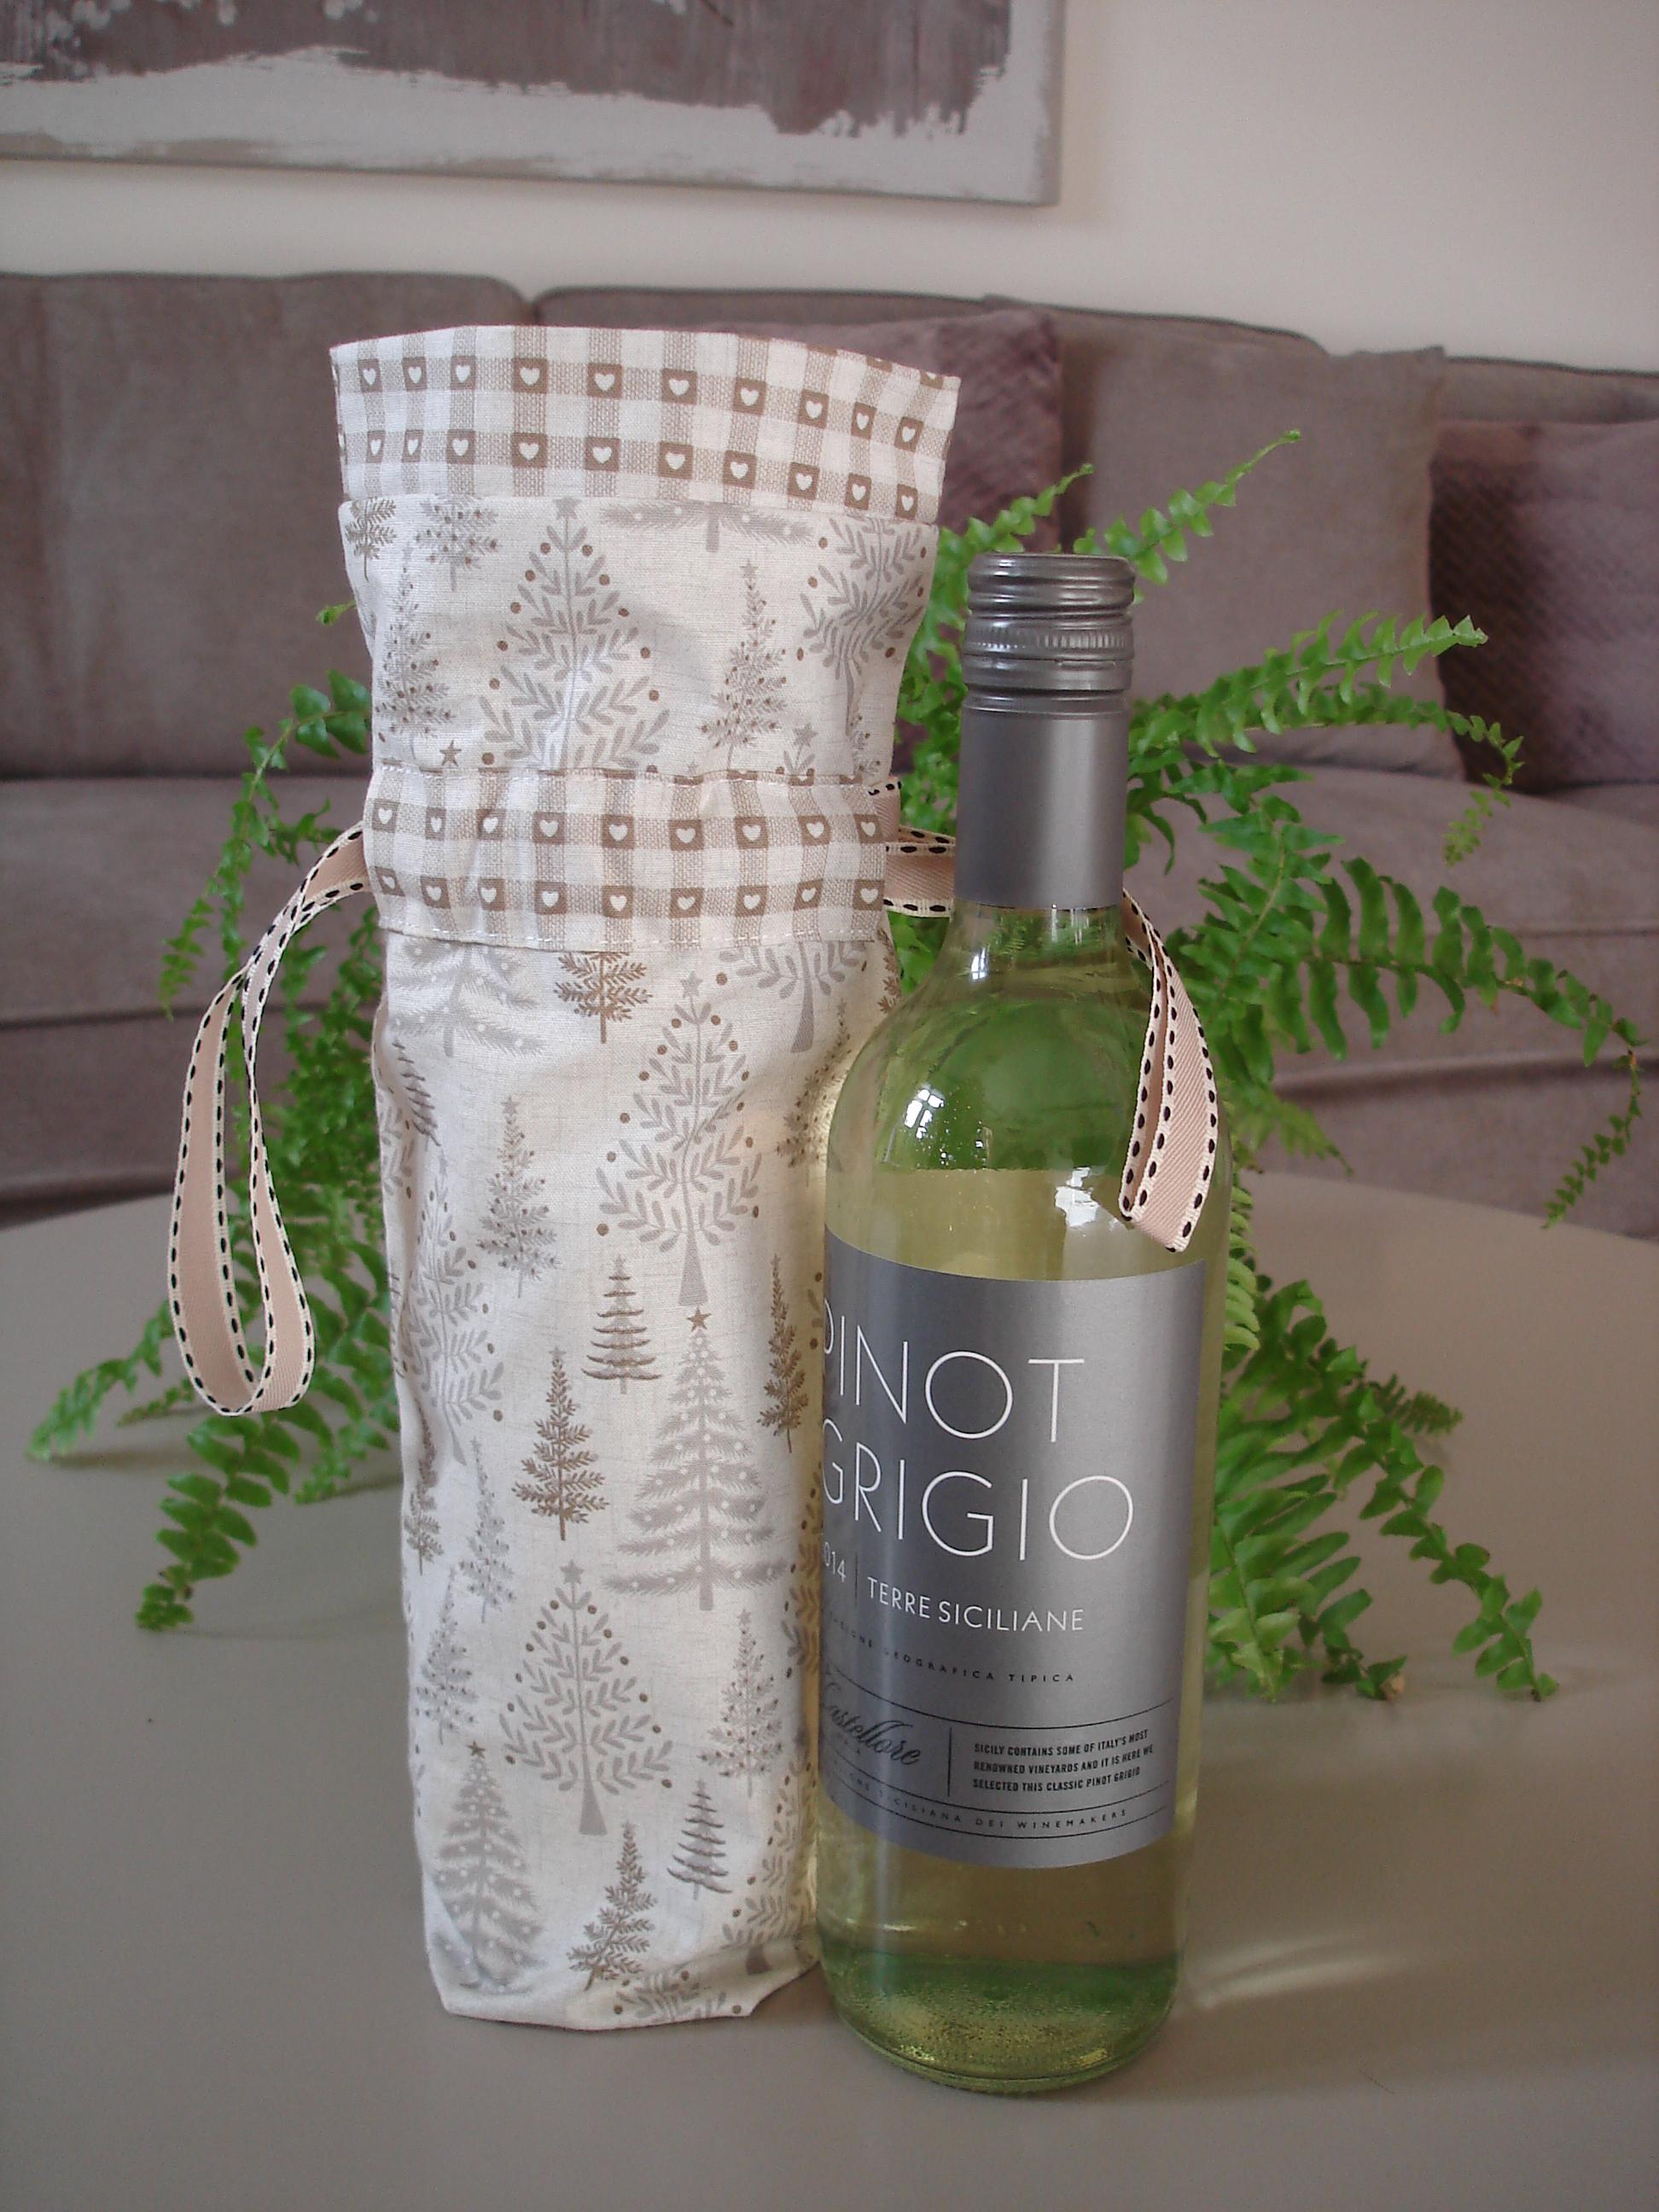 Handmade fabric wine bottle gift bags